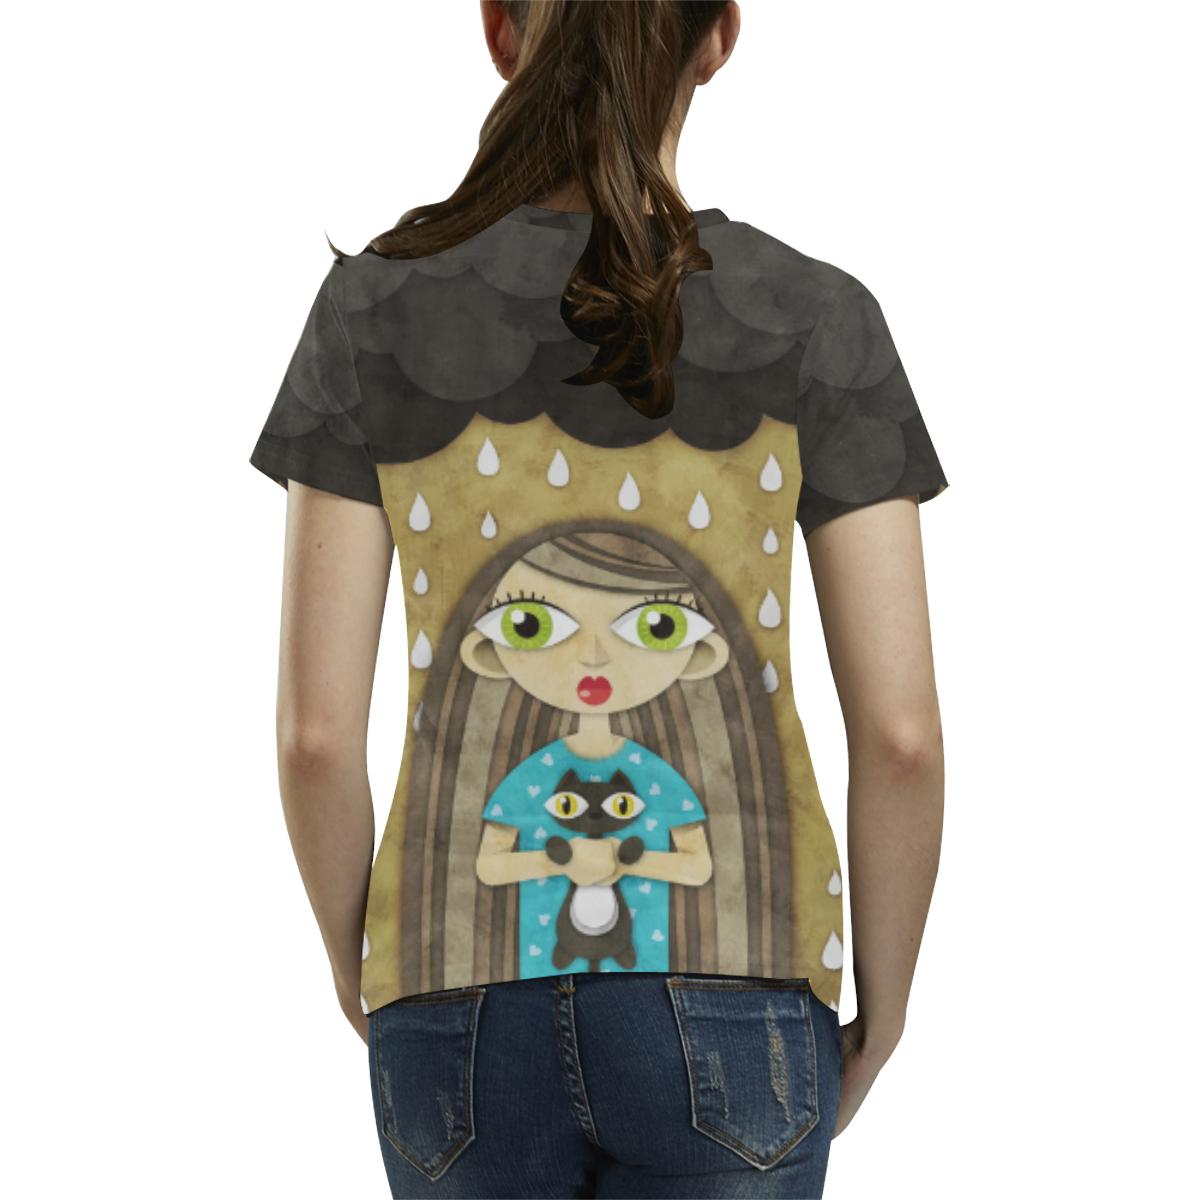 We Love Rain All Over Print T-Shirt for Women (USA Size) (Model T40)